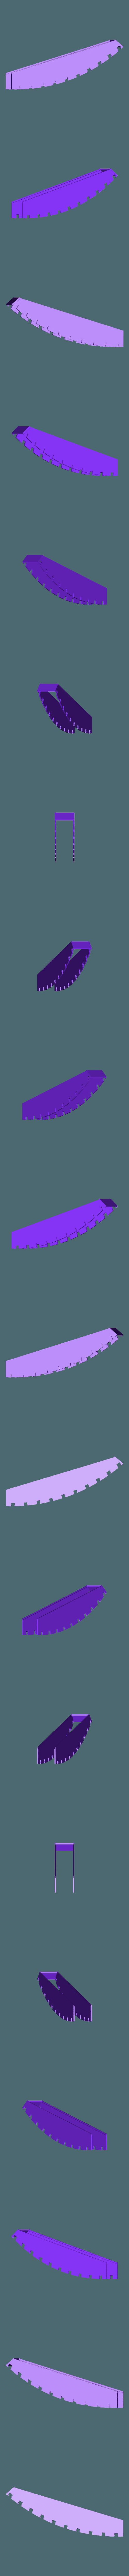 1.stl Download free STL file Deagostini Millennium Falcon Engine Exhaust SOLO version • 3D print object, boryelwoc